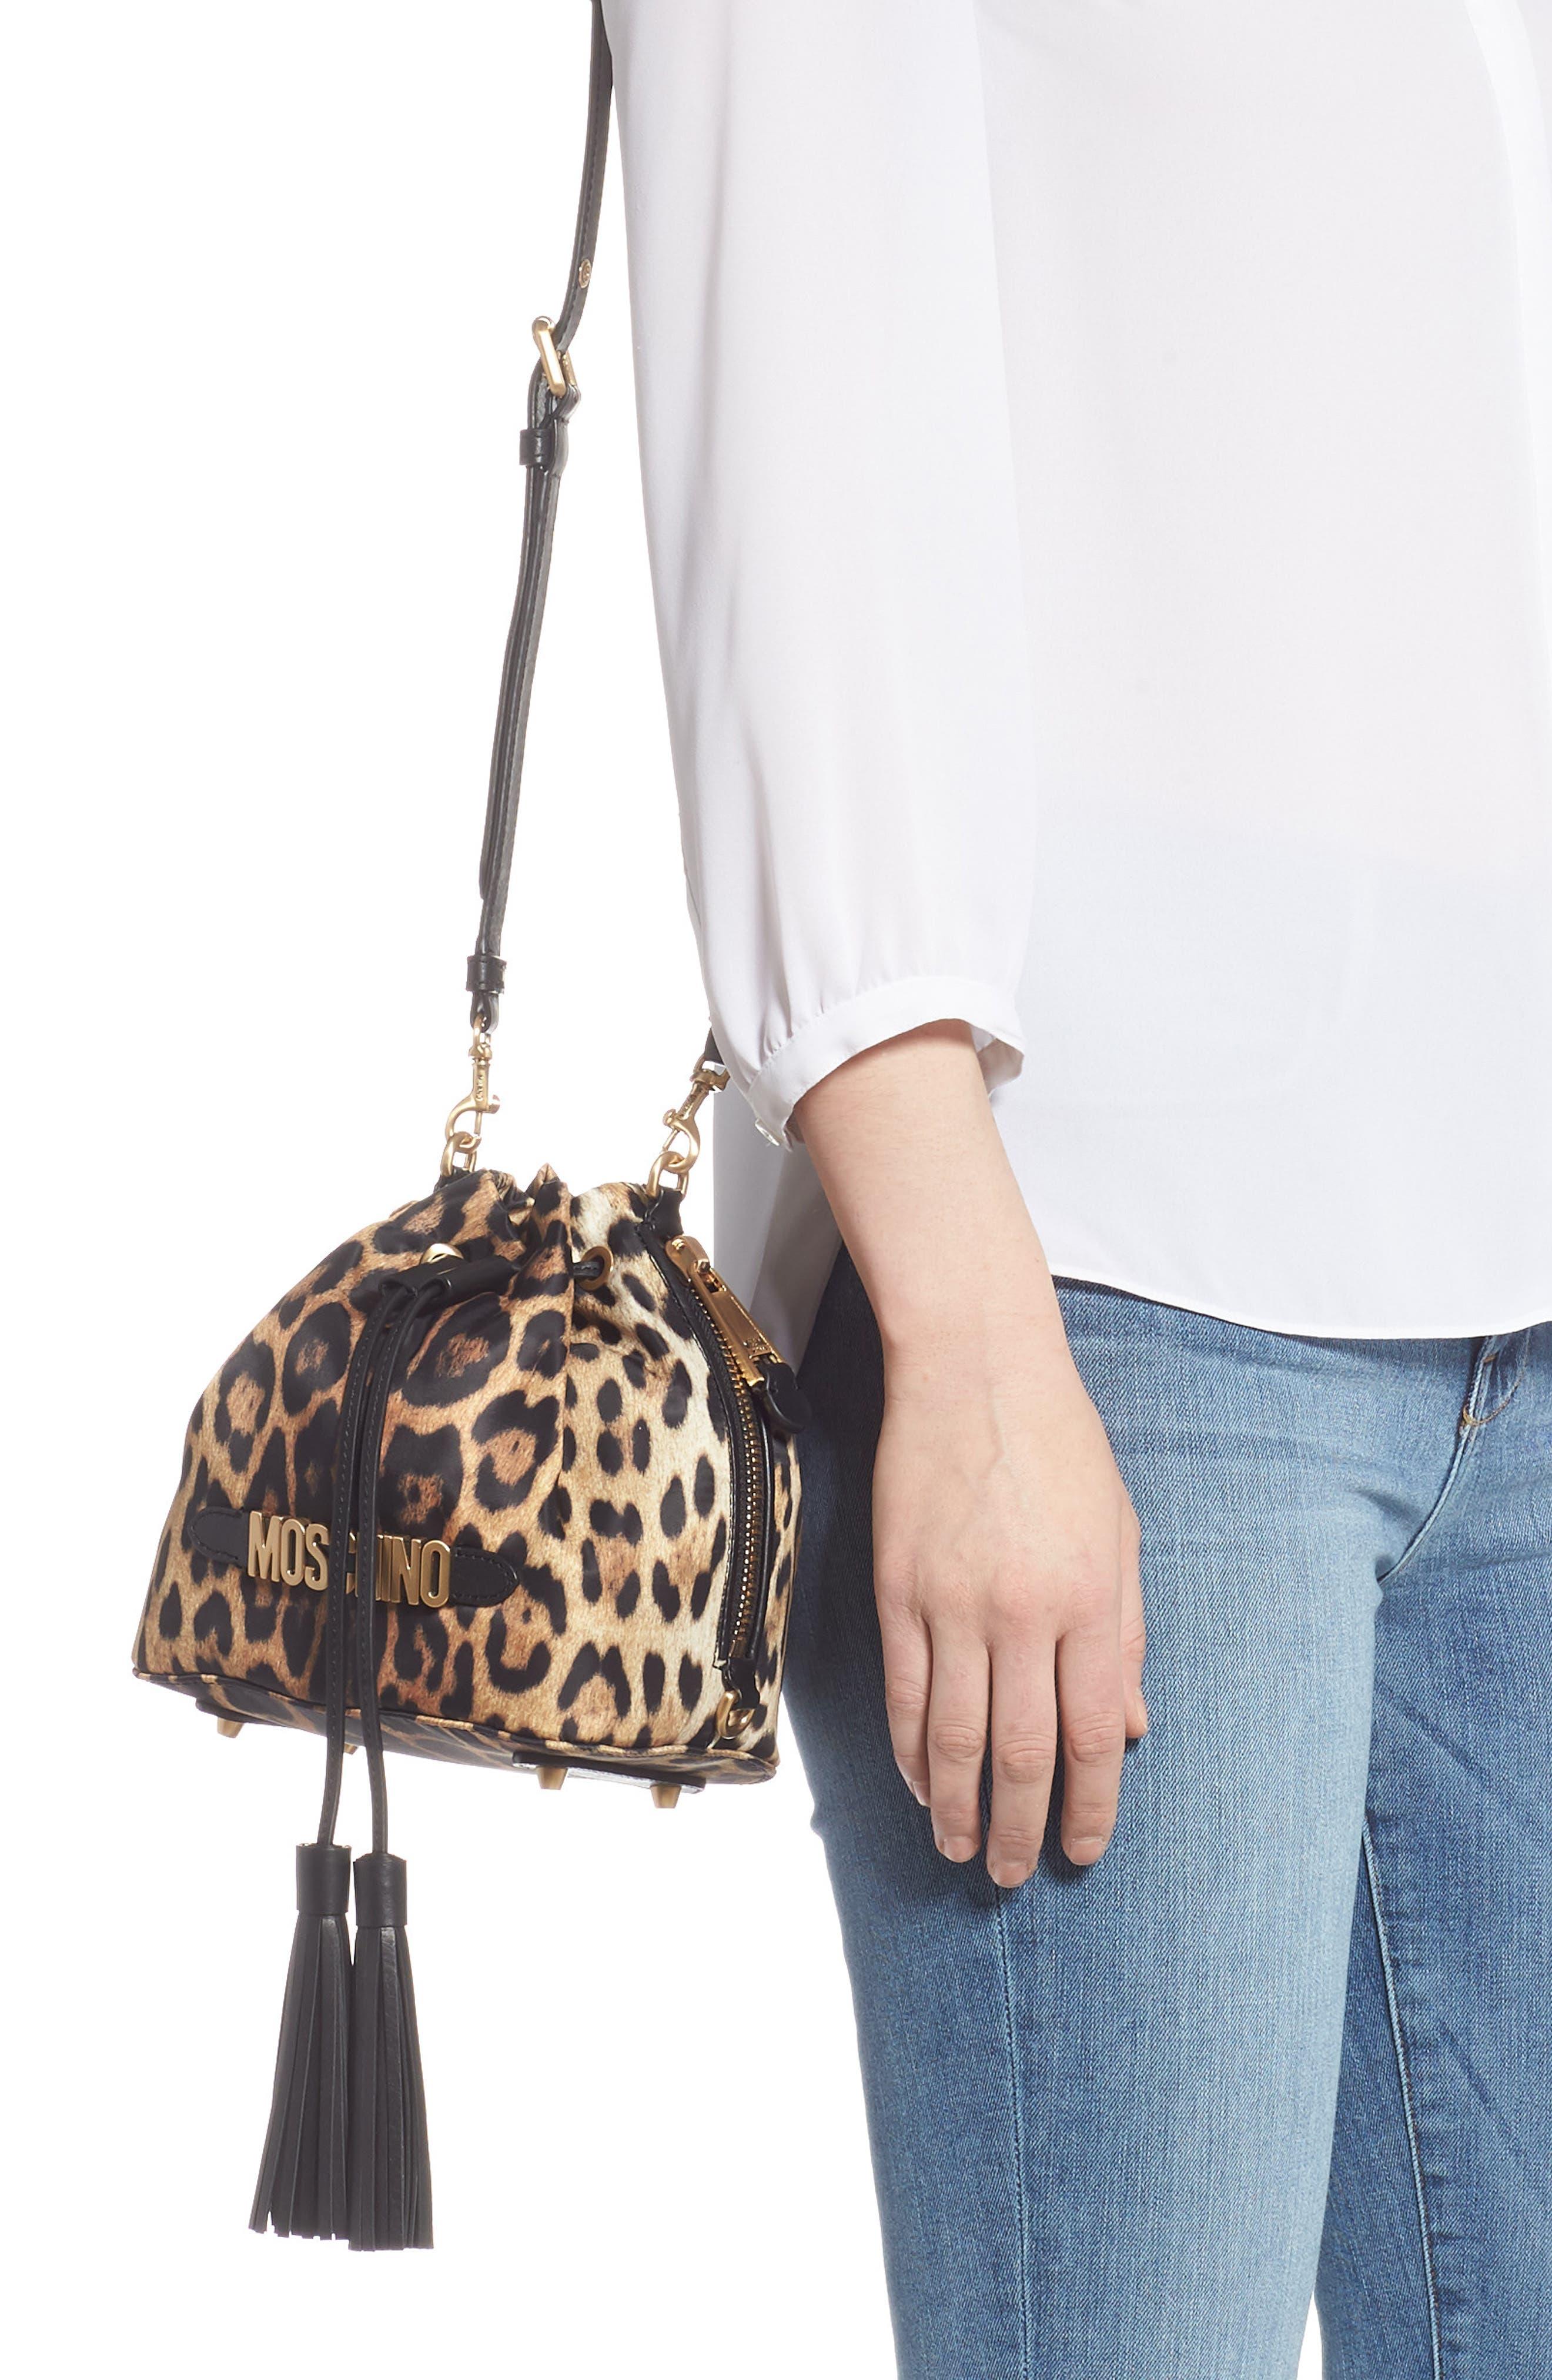 MOSCHINO, Leopard Print Nylon Convertible Bucket Bag, Alternate thumbnail 3, color, BLACK